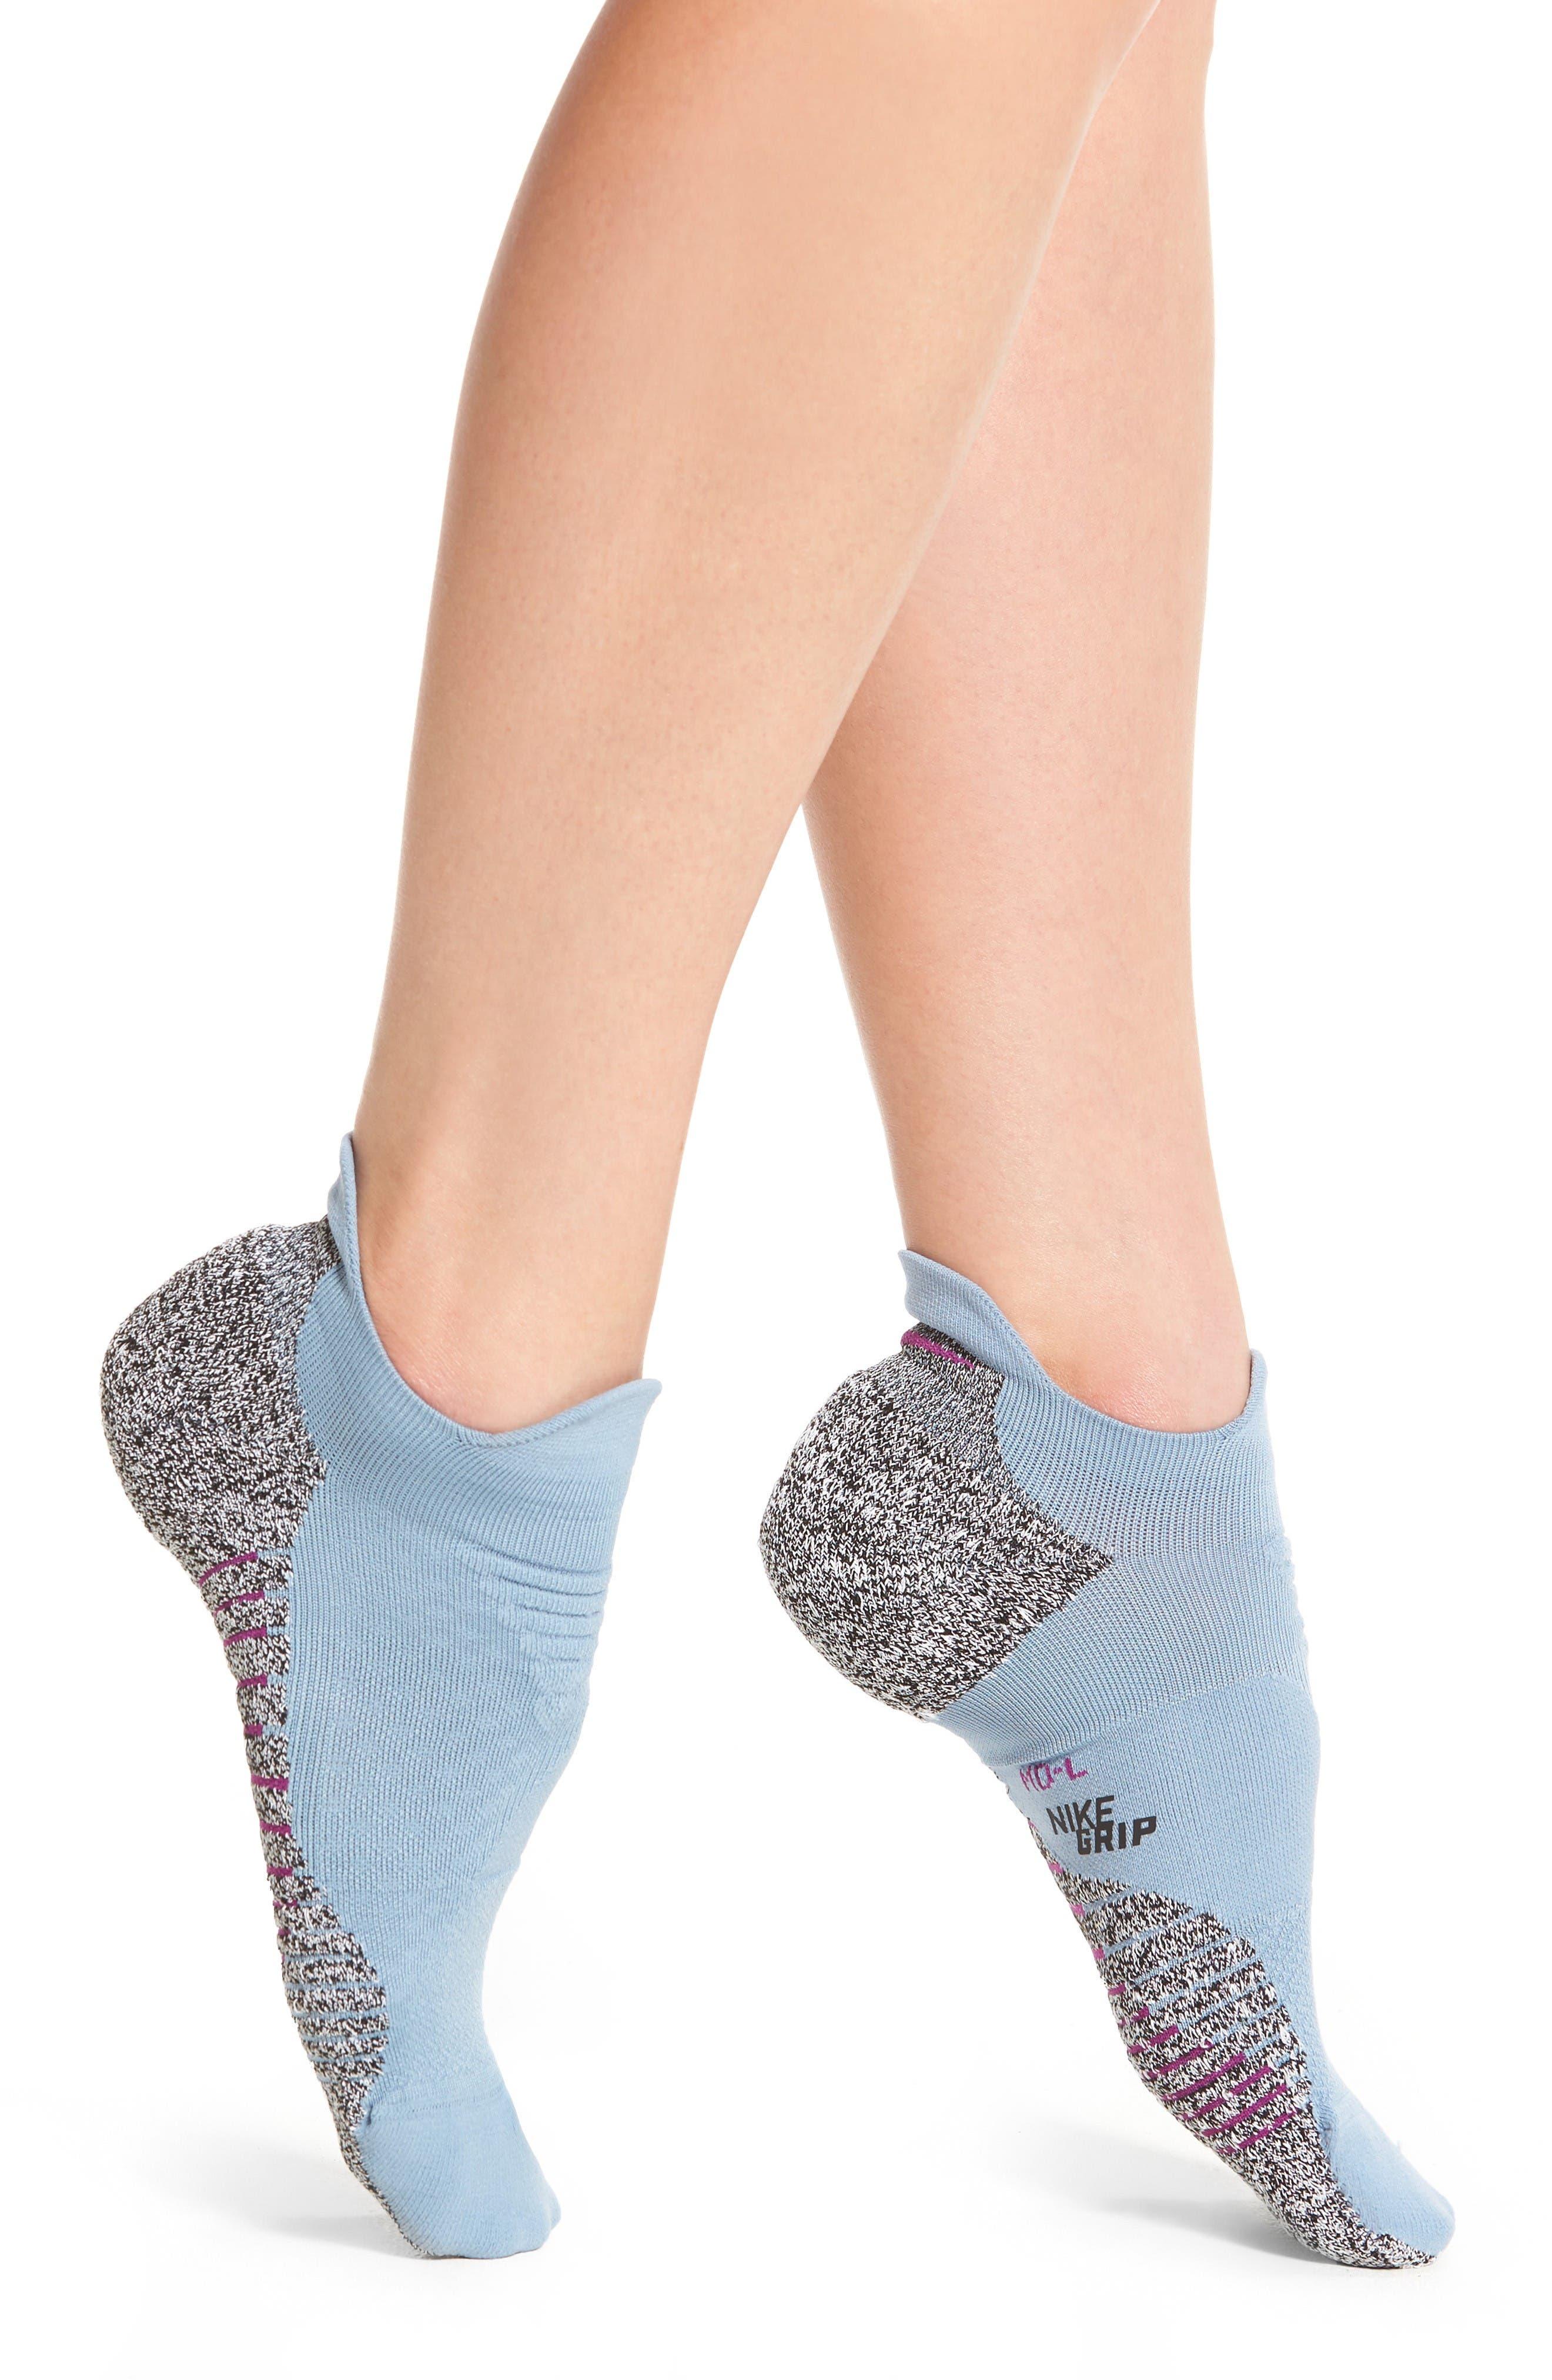 Nike NikeGrip Low Cut Socks